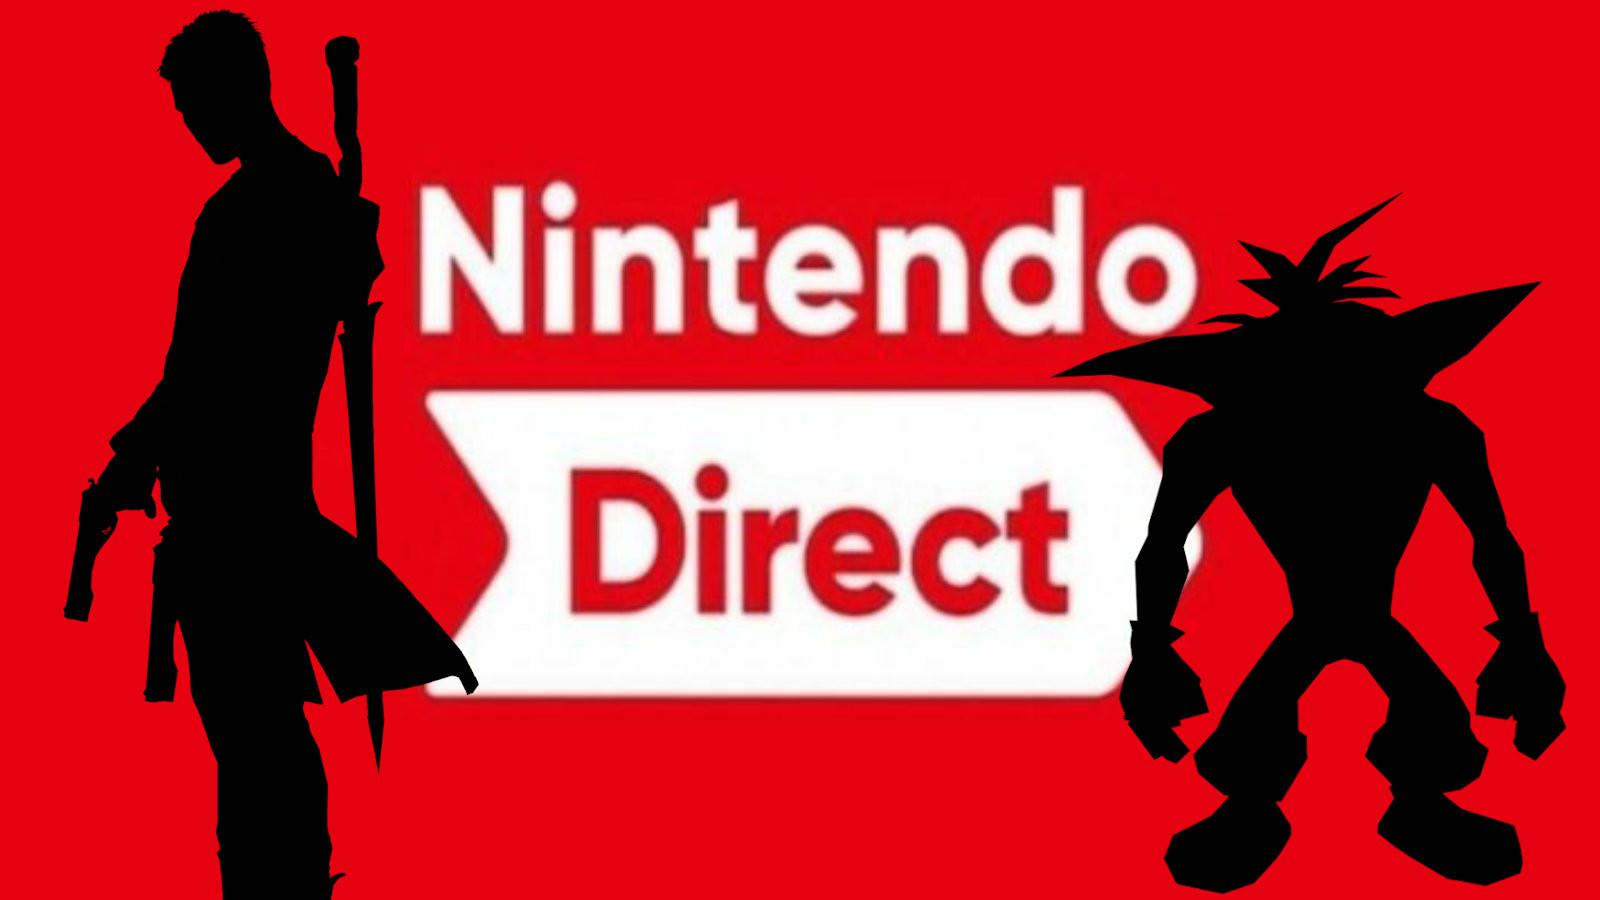 Dante and Crash Bandicoot in a Nintendo Direct